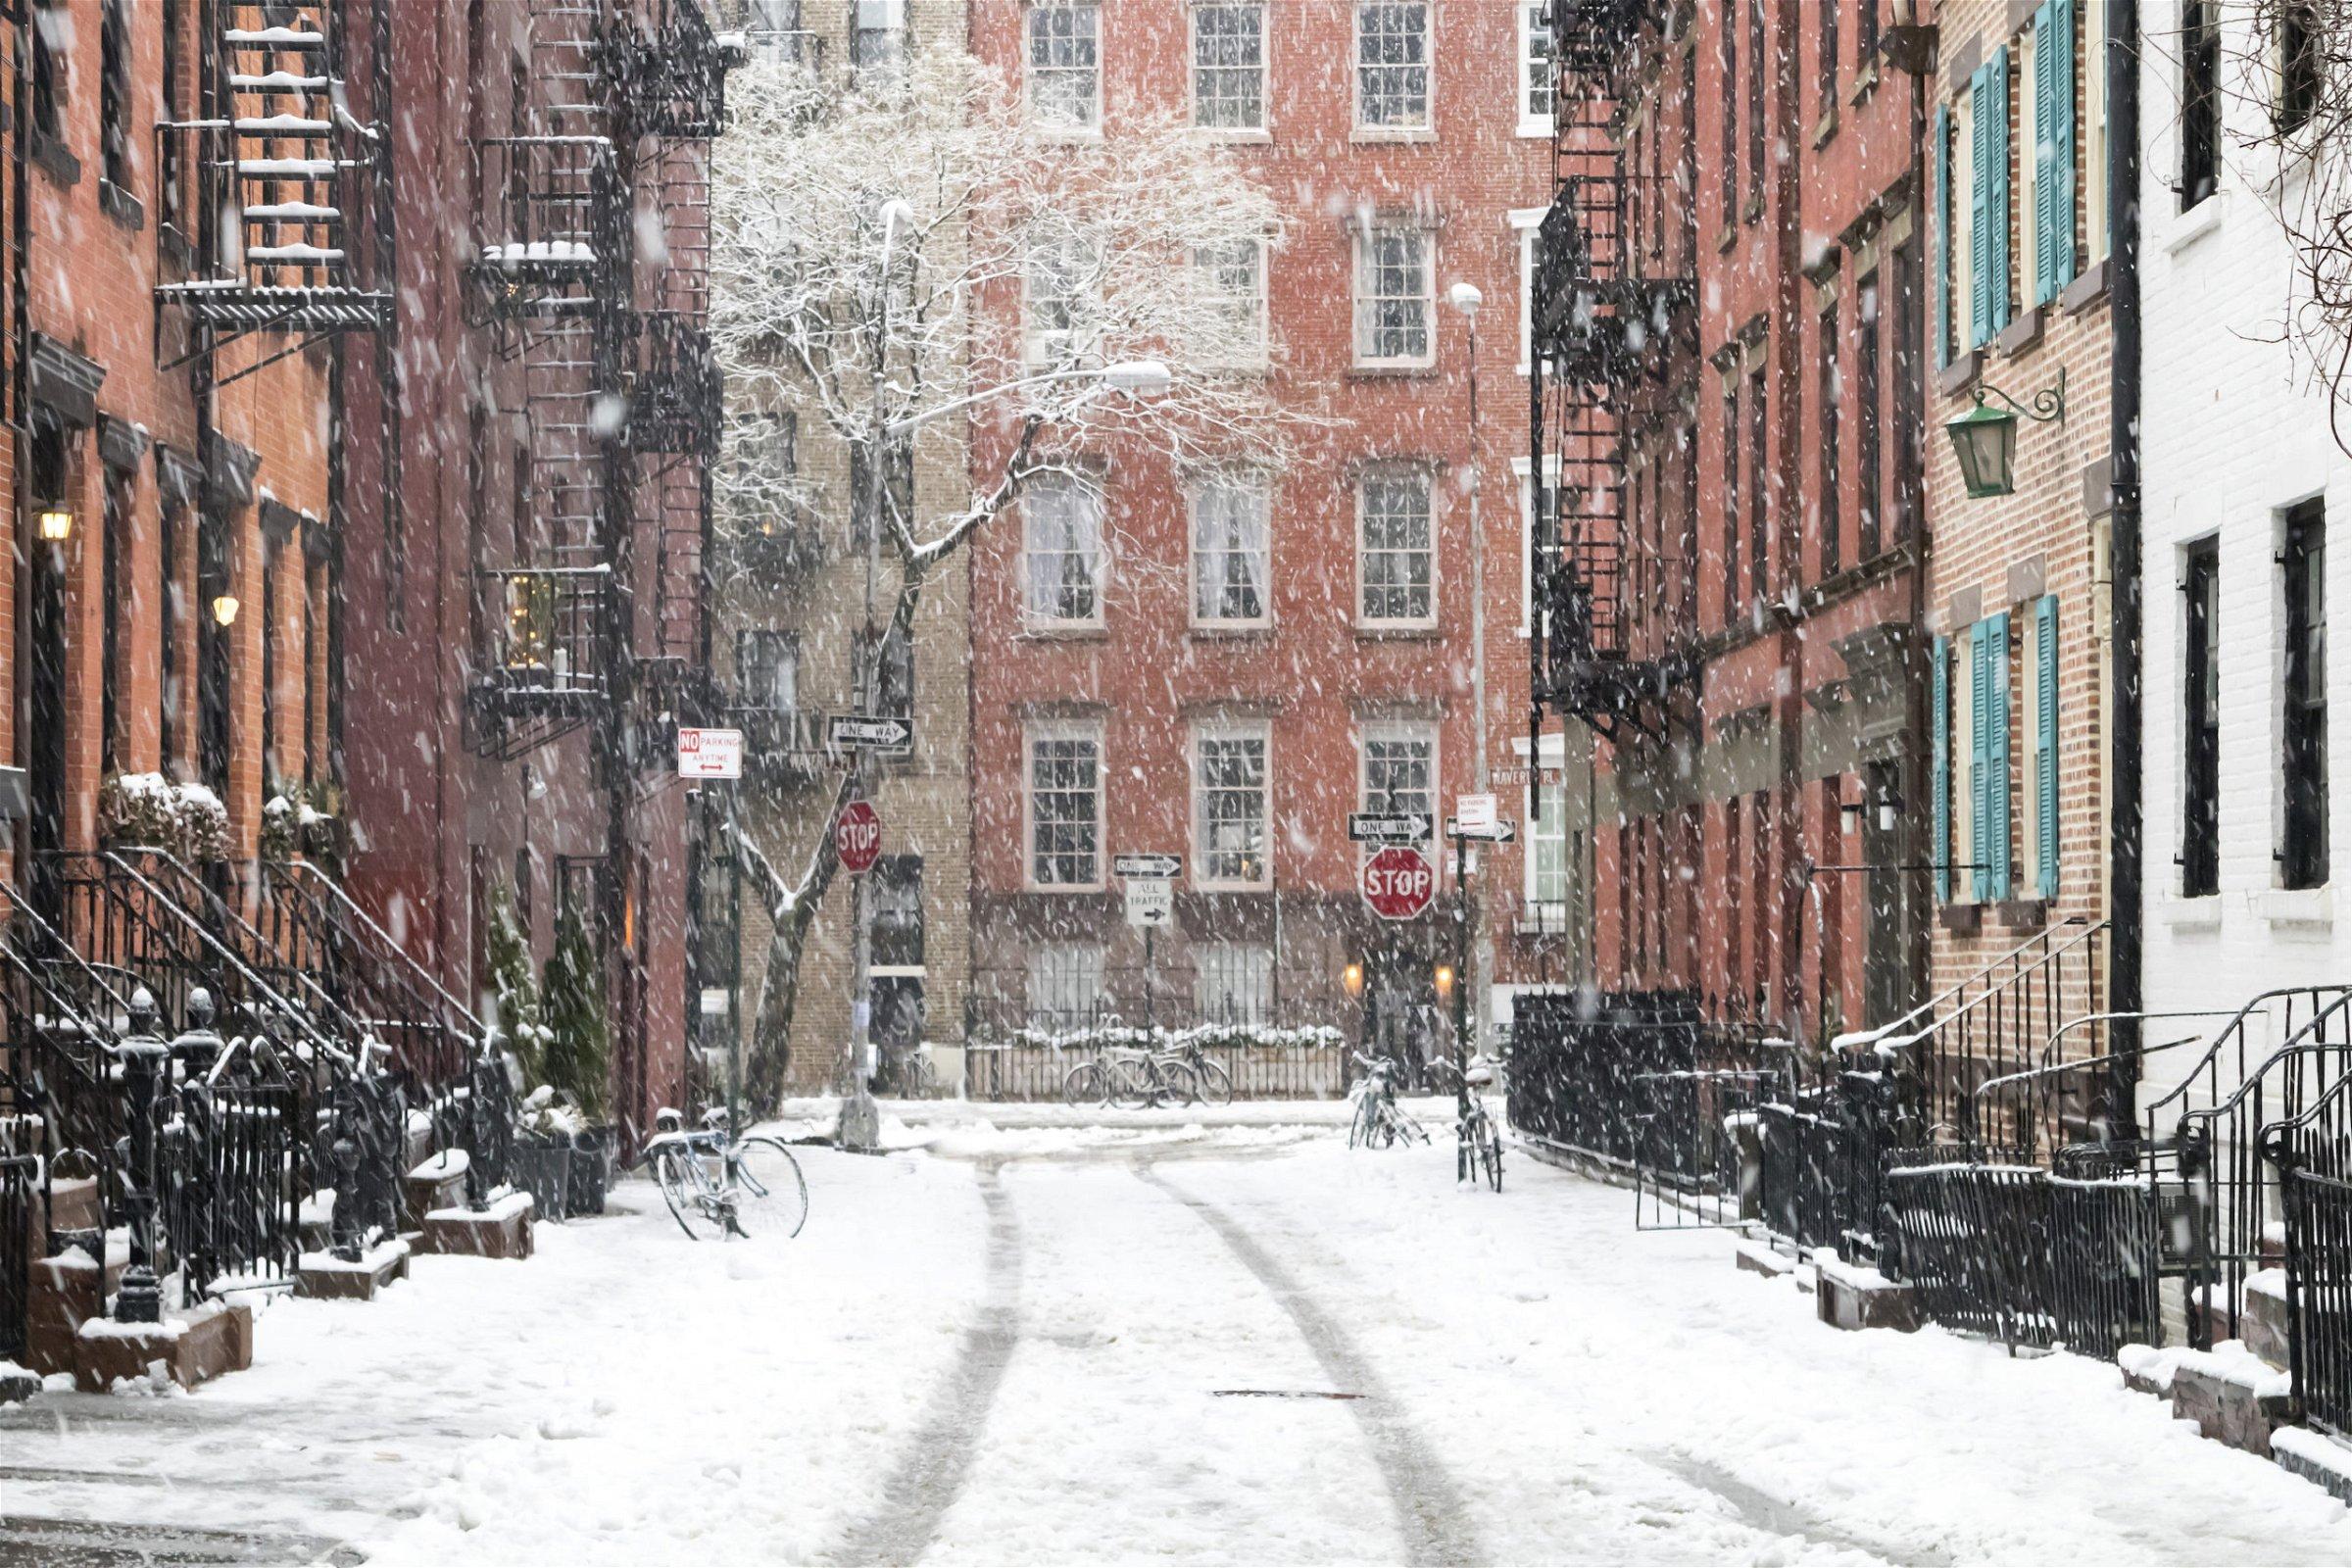 Accidents on a Snowy or Icy Sidewalk